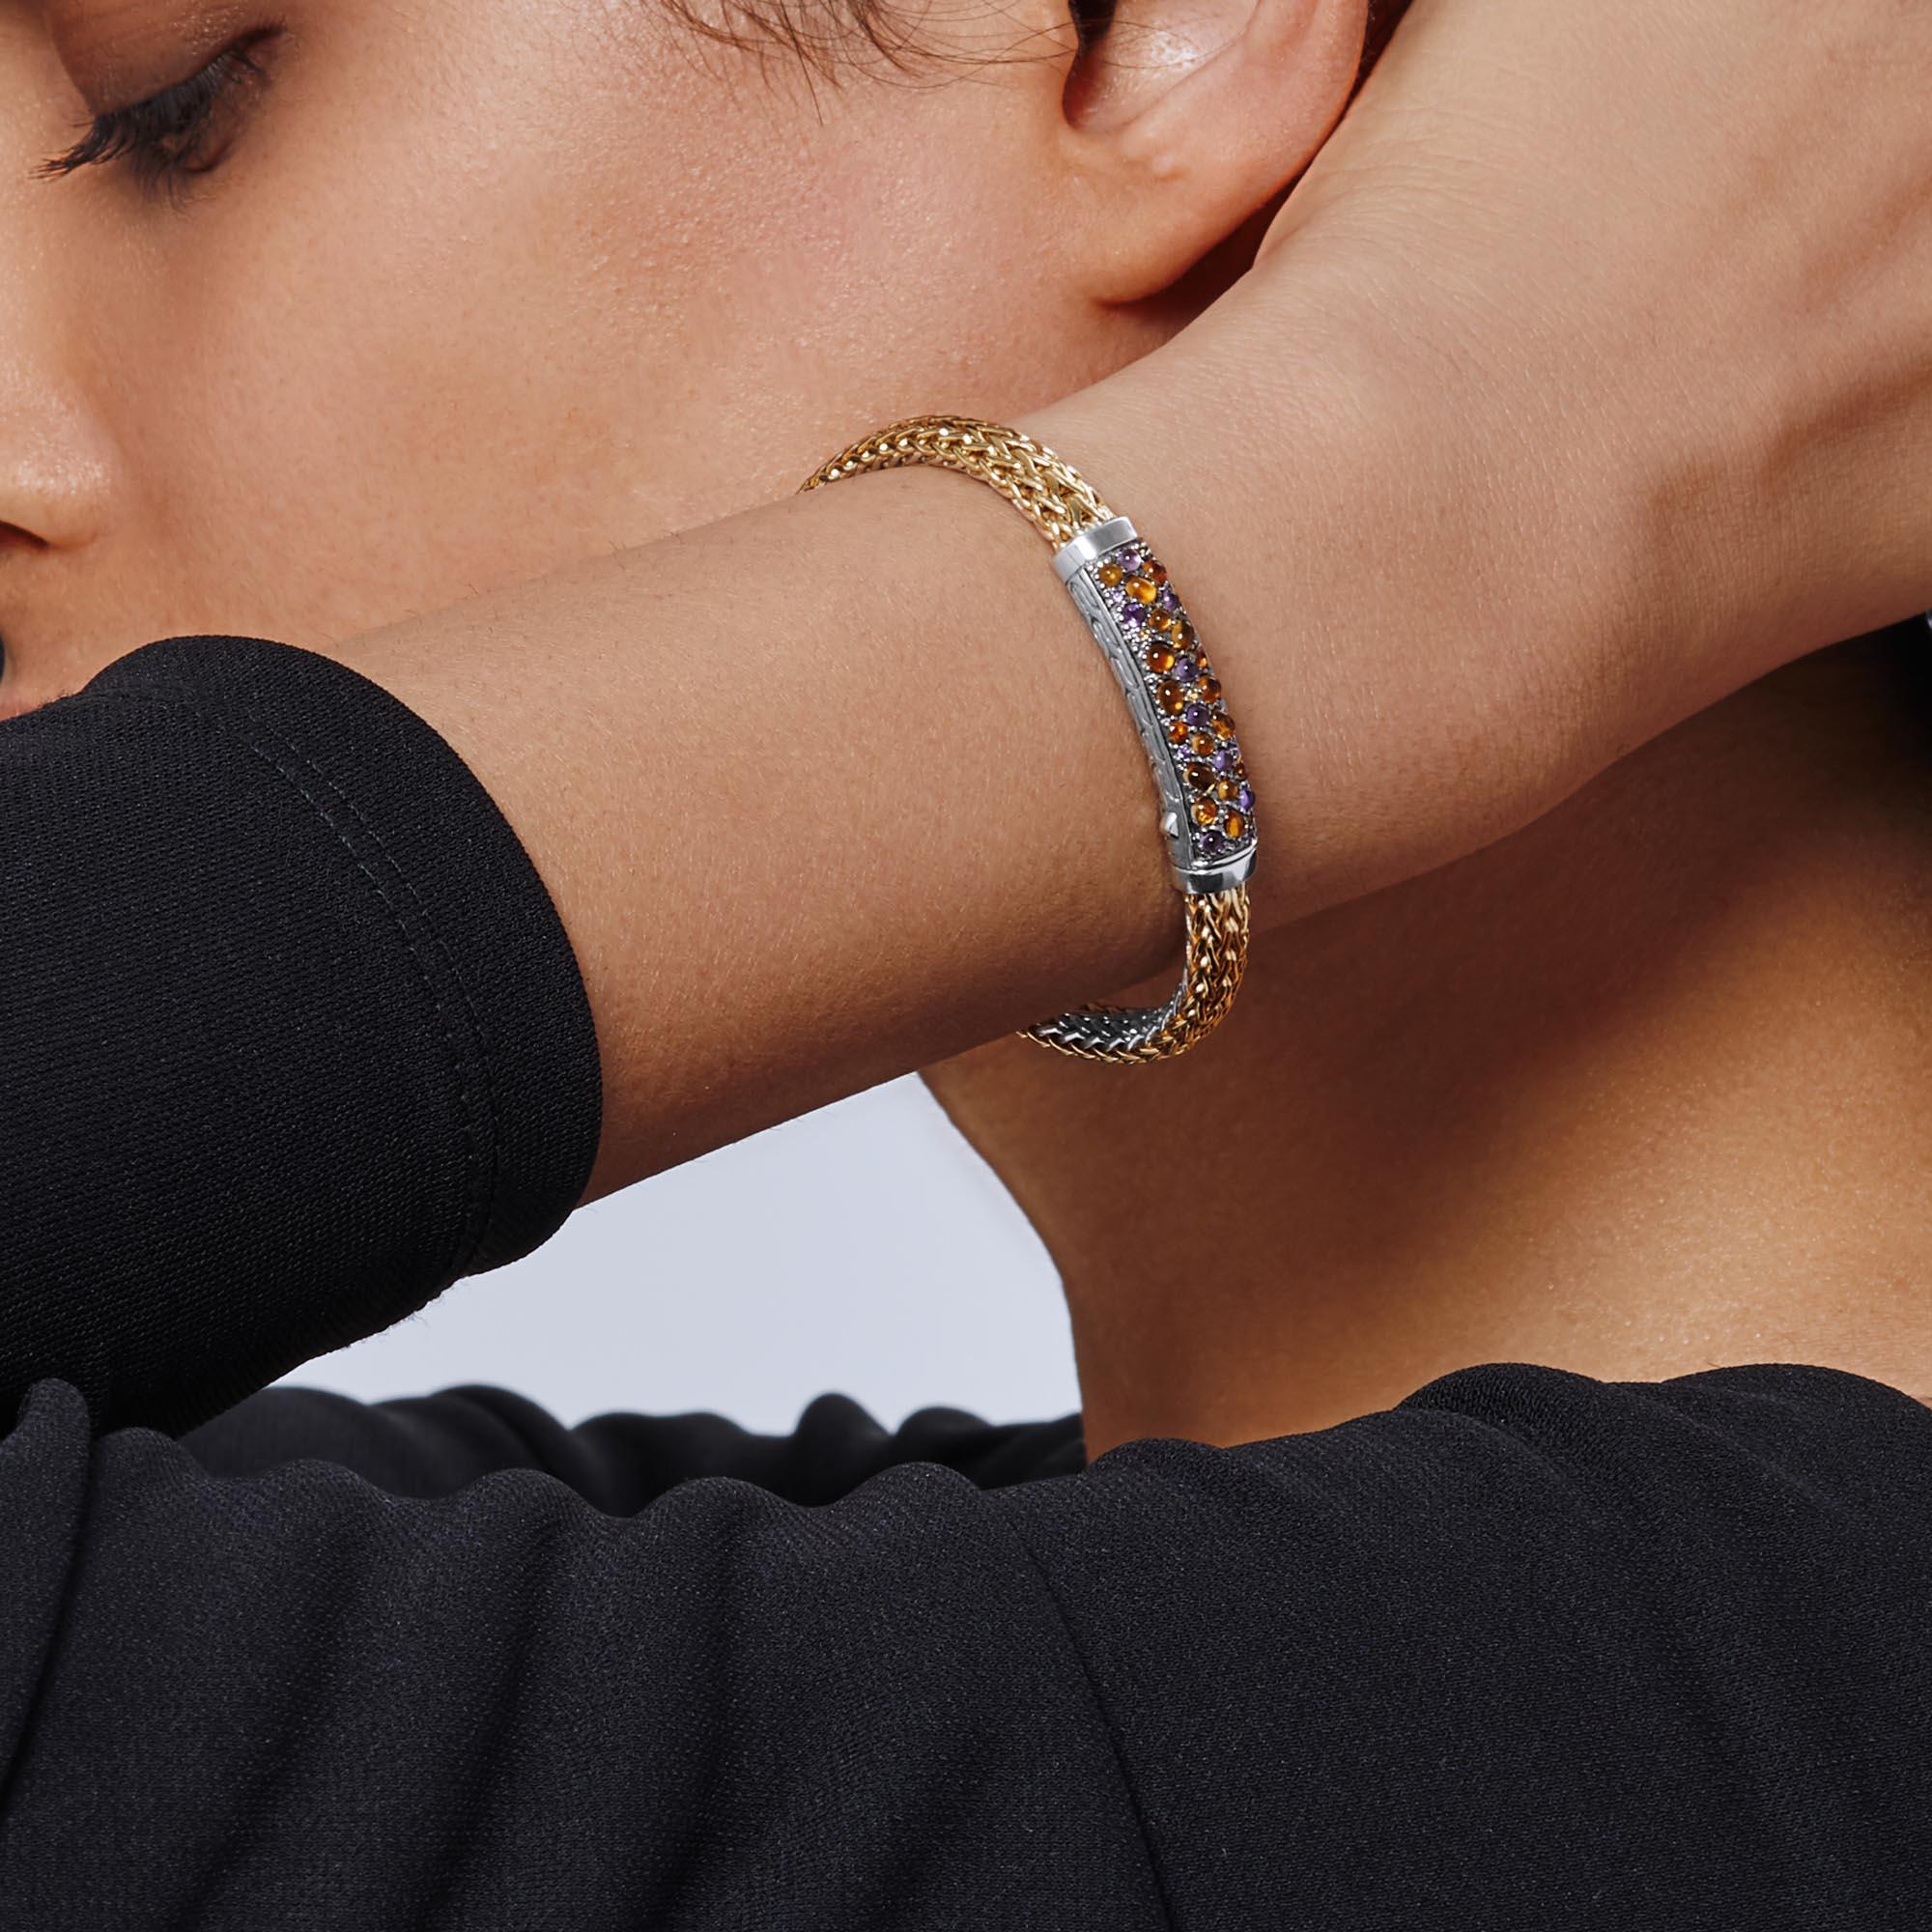 Classic Chain 6.5MM Station Bracelet in Silver, 18K Gold, Gem, Amethyst, large